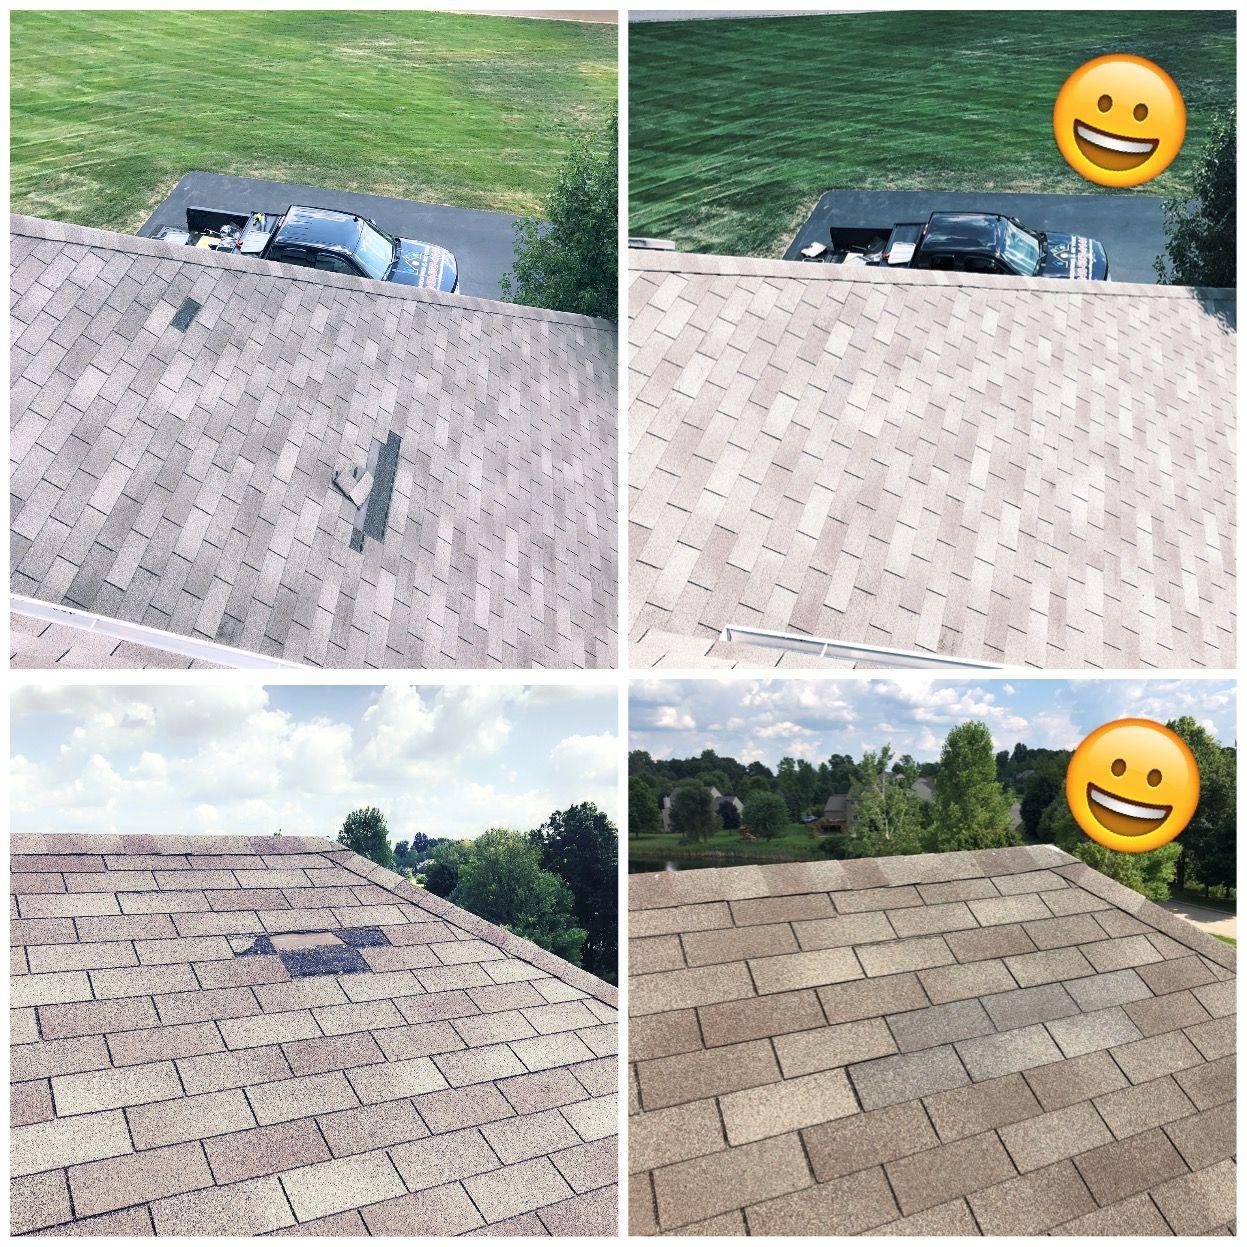 Roof Repairs Roof leak repair, Roof repair, Roofing